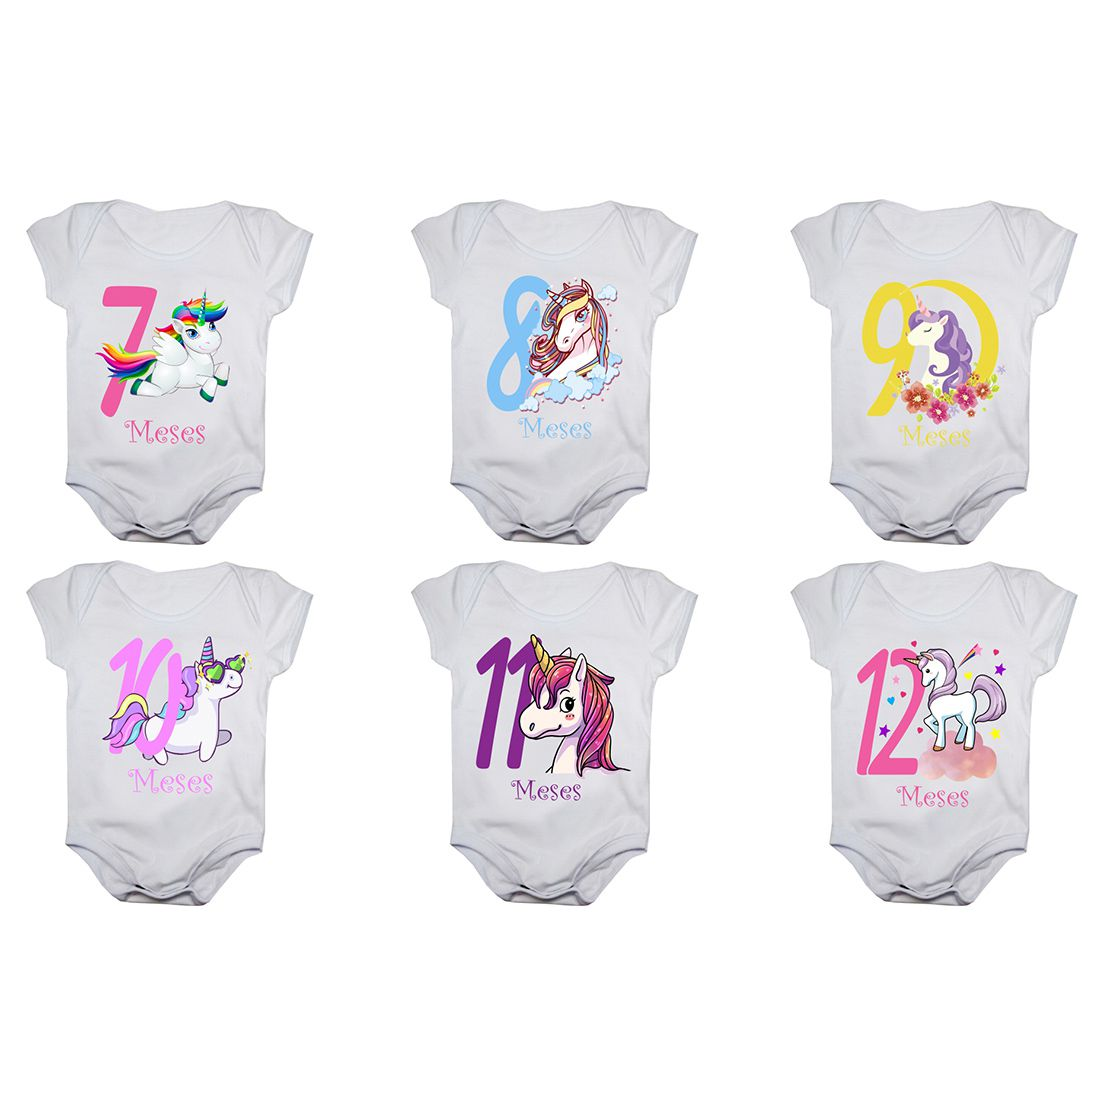 Kit body bebê mesversario manga curta estampa unicórnio 12 bodies 1 a 12 meses